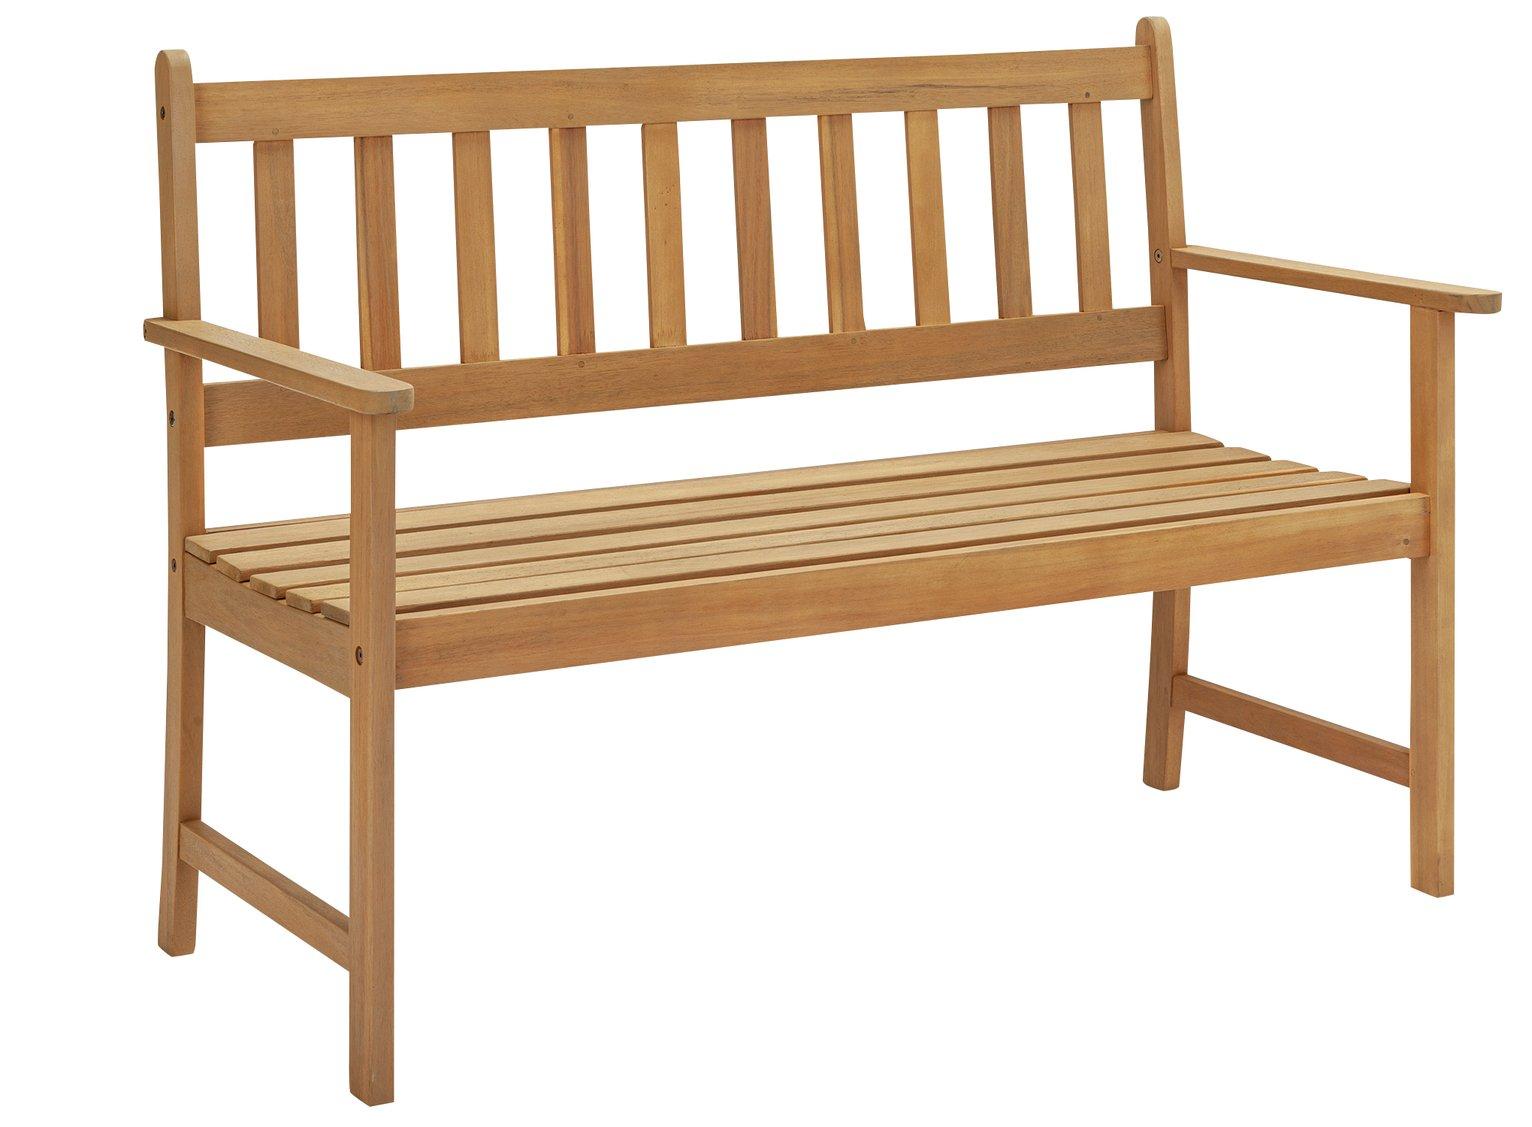 Argos Home Newbury Wooden 2 Seater Garden Bench - Light Wood